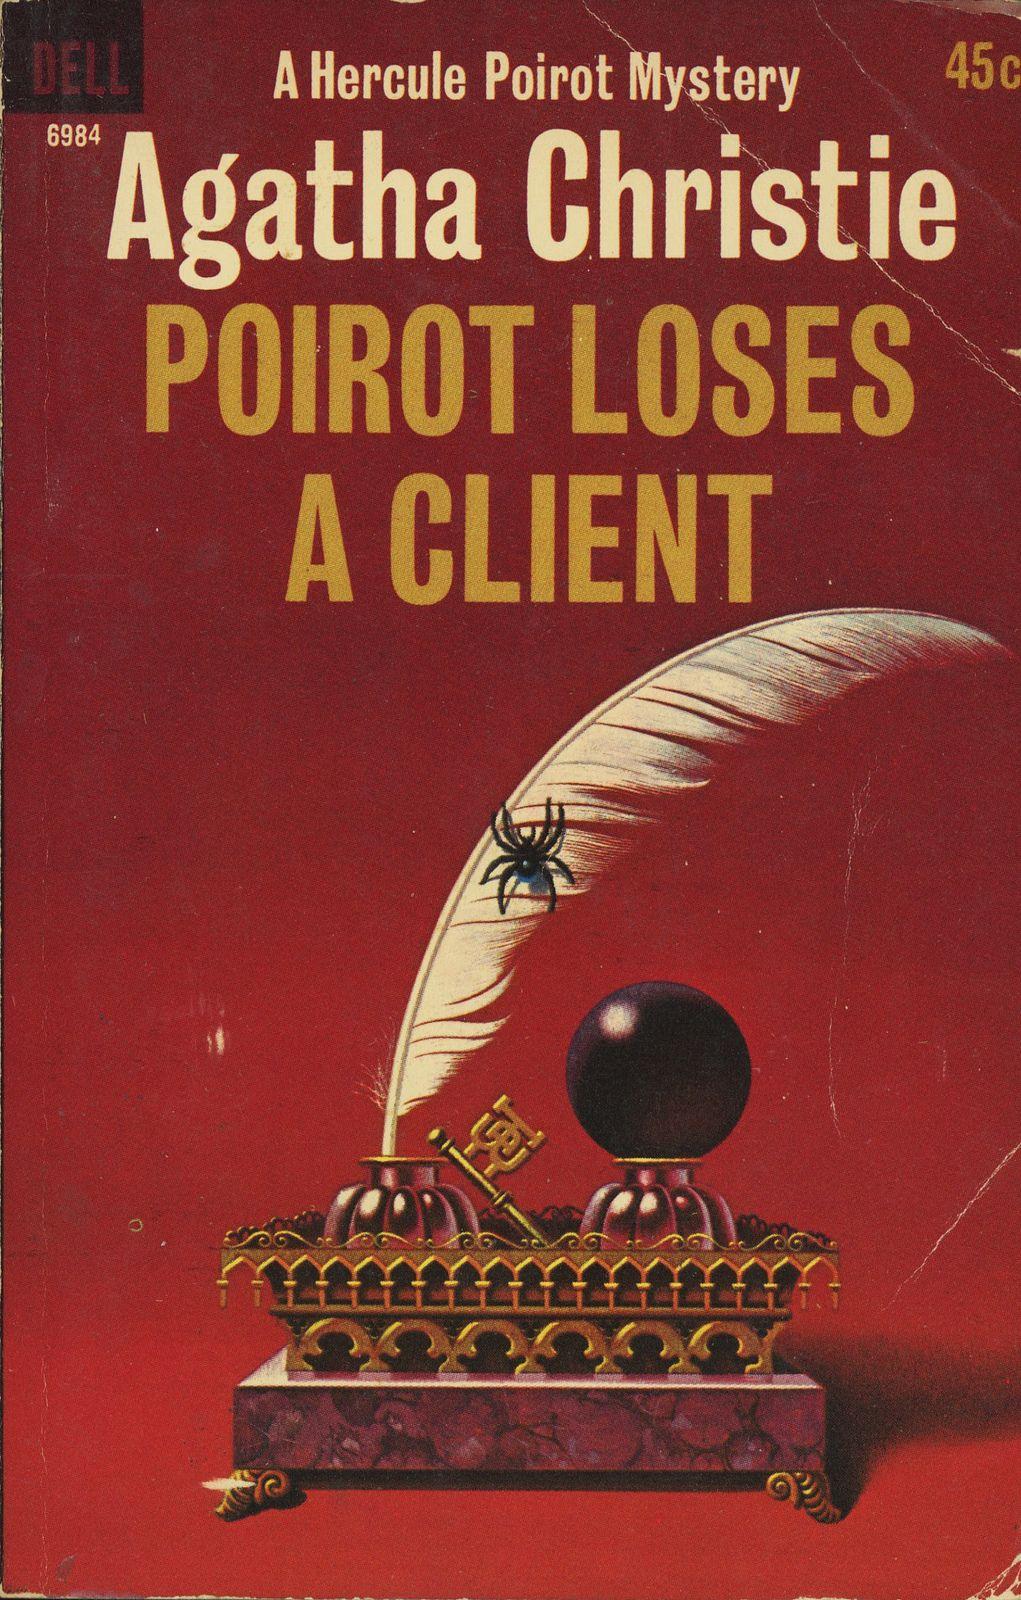 Dell books 6984 agatha christie poirot loses a client